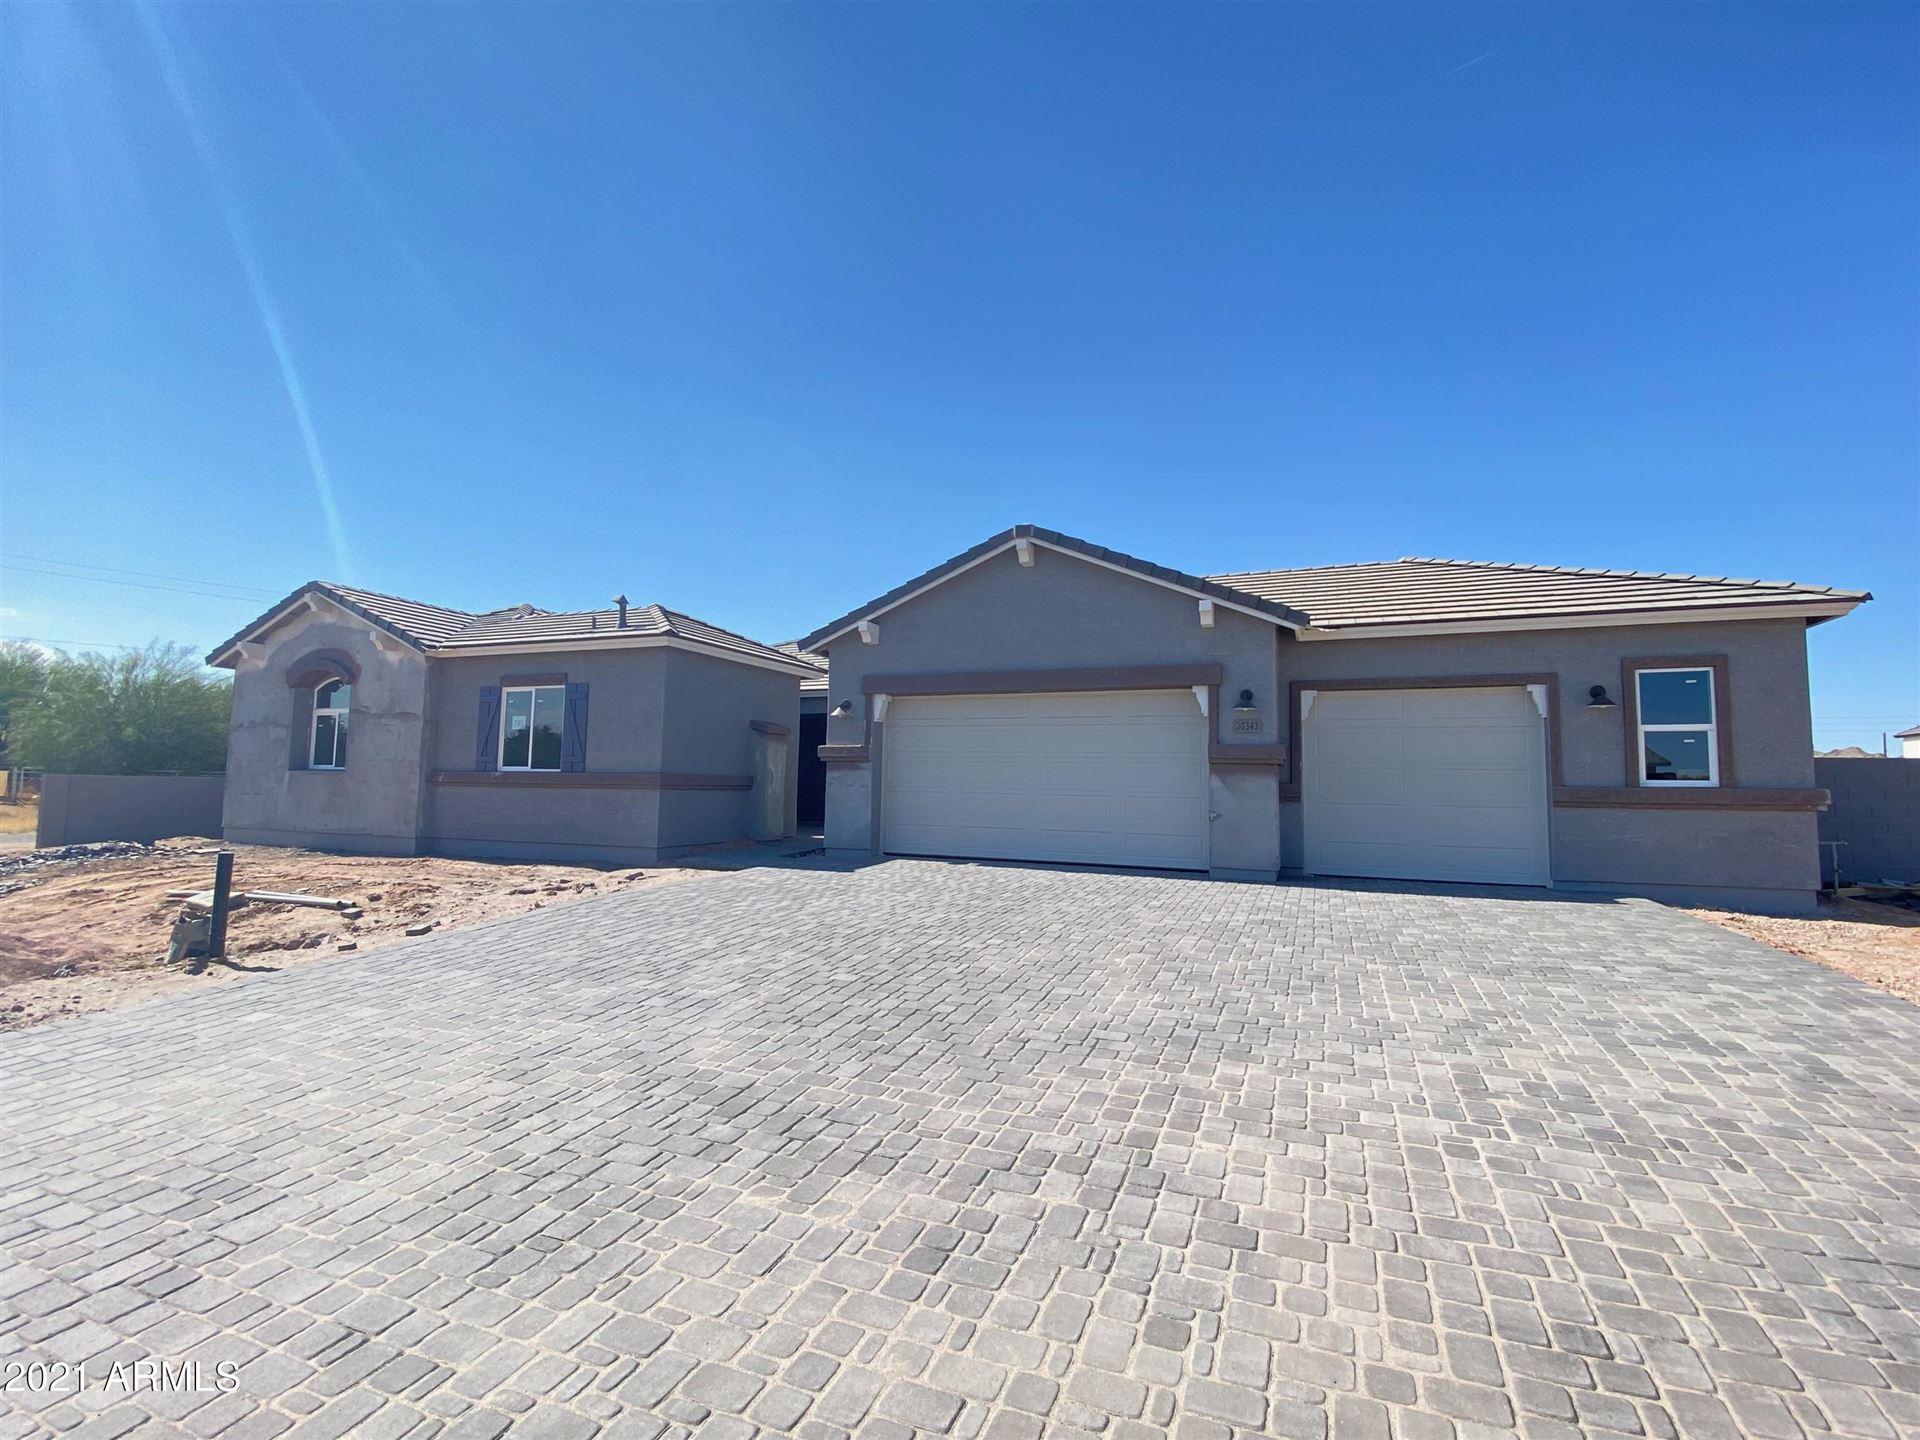 Photo of 20343 E ORCHARD Lane, Queen Creek, AZ 85142 (MLS # 6248714)